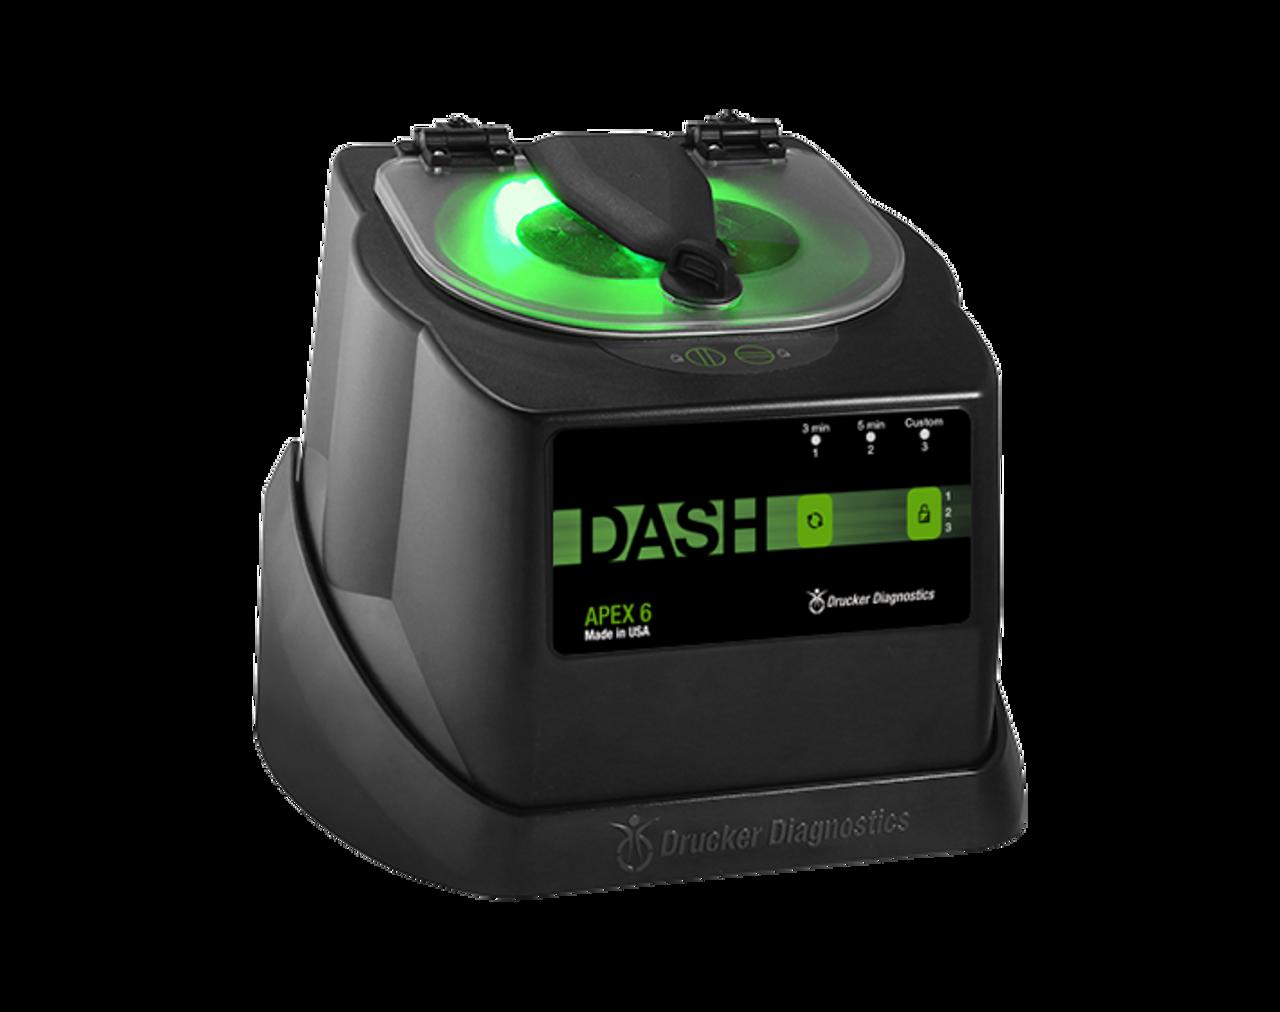 Drucker Dash APEX 6 Centrifuge (Statspin II replacement)